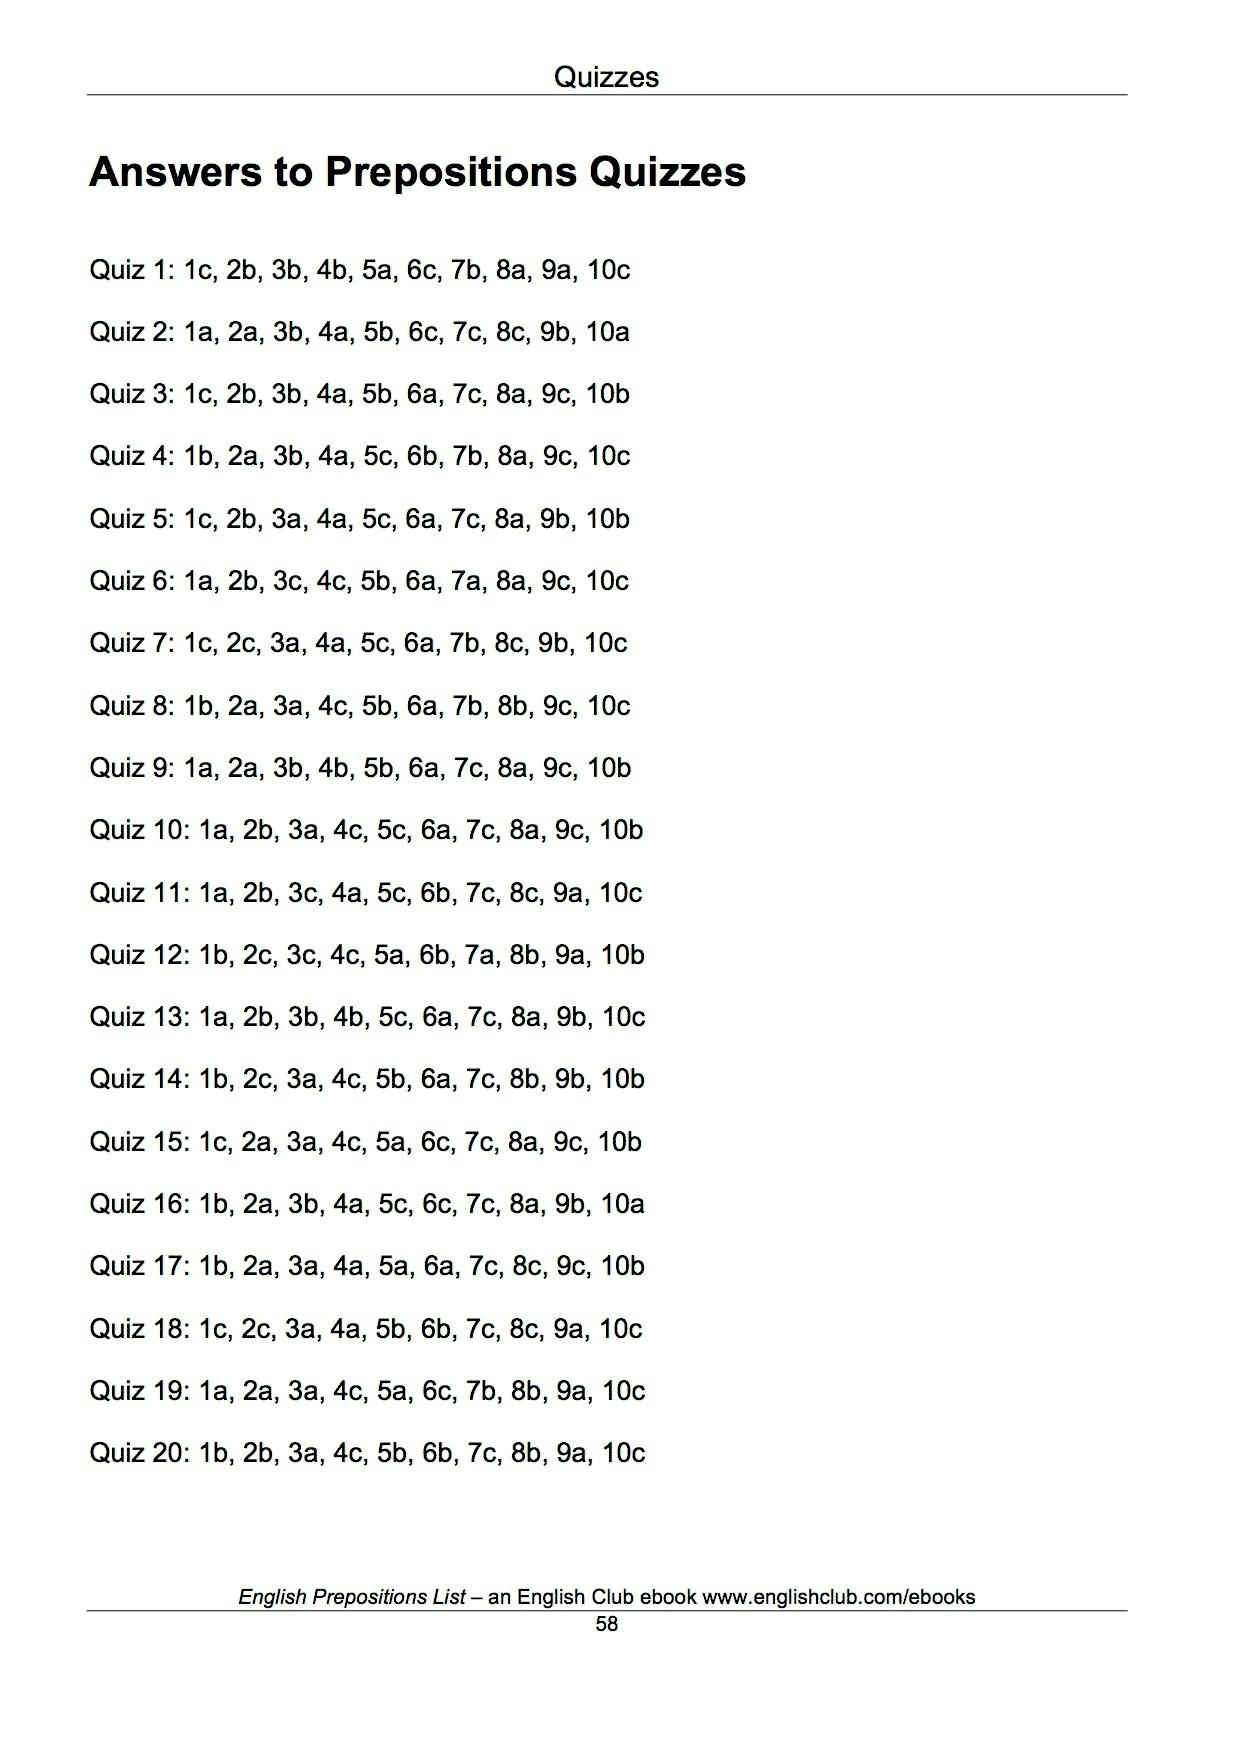 English Prepositions List Ebook By Josef Essberger